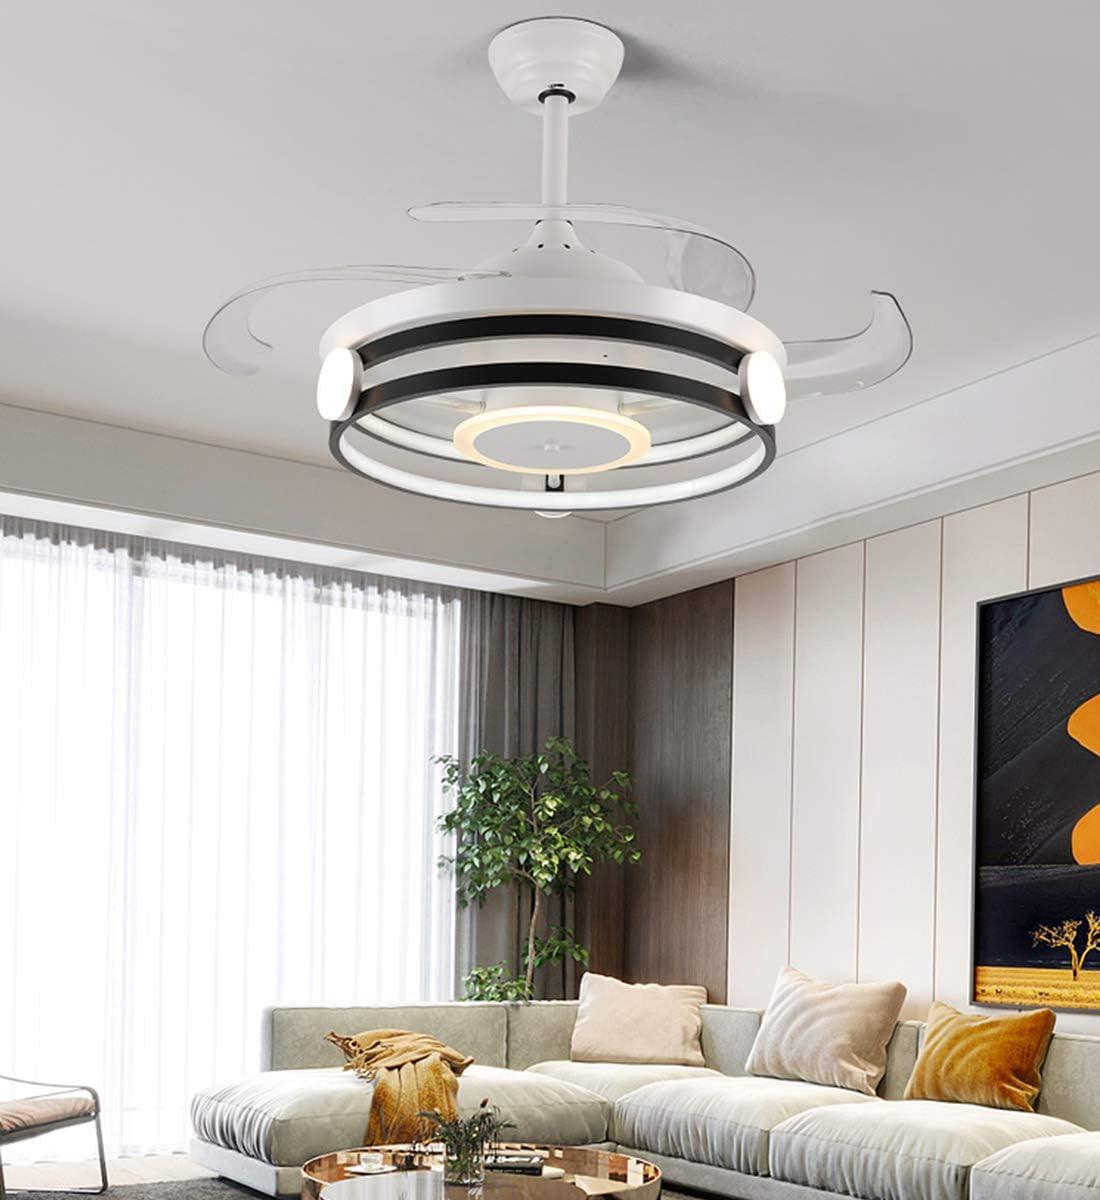 Ventilador de Techo Moderno con Luz, 4 Aspas Retráctiles Lámpara LED Remota de 60 W 3 Cambios de Color 3 Velocidades, Motor Silencioso con Kits de LED Incluidos: Amazon.es: Iluminación